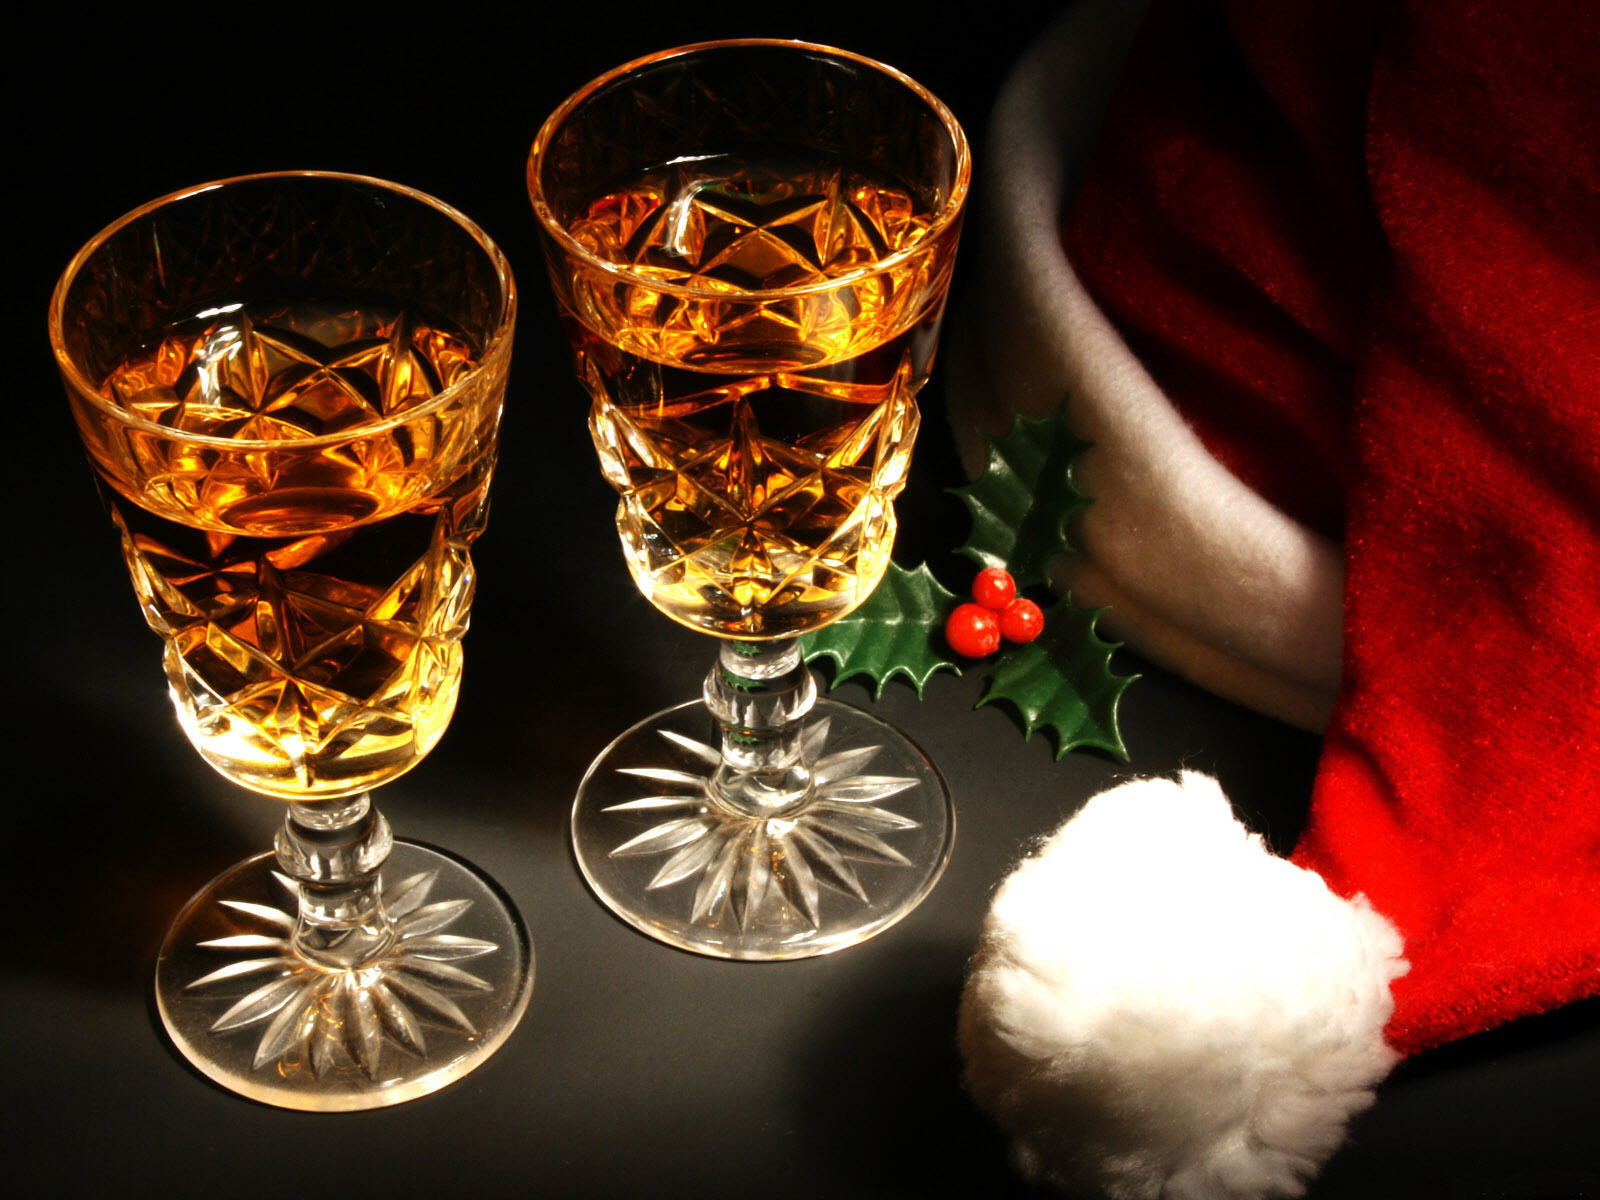 http://2.bp.blogspot.com/_hN-RNLUCt5Q/TQzWFBa1ToI/AAAAAAAACL0/q0LdCDW507Y/s1600/Christmas+wallpaper+11.jpg